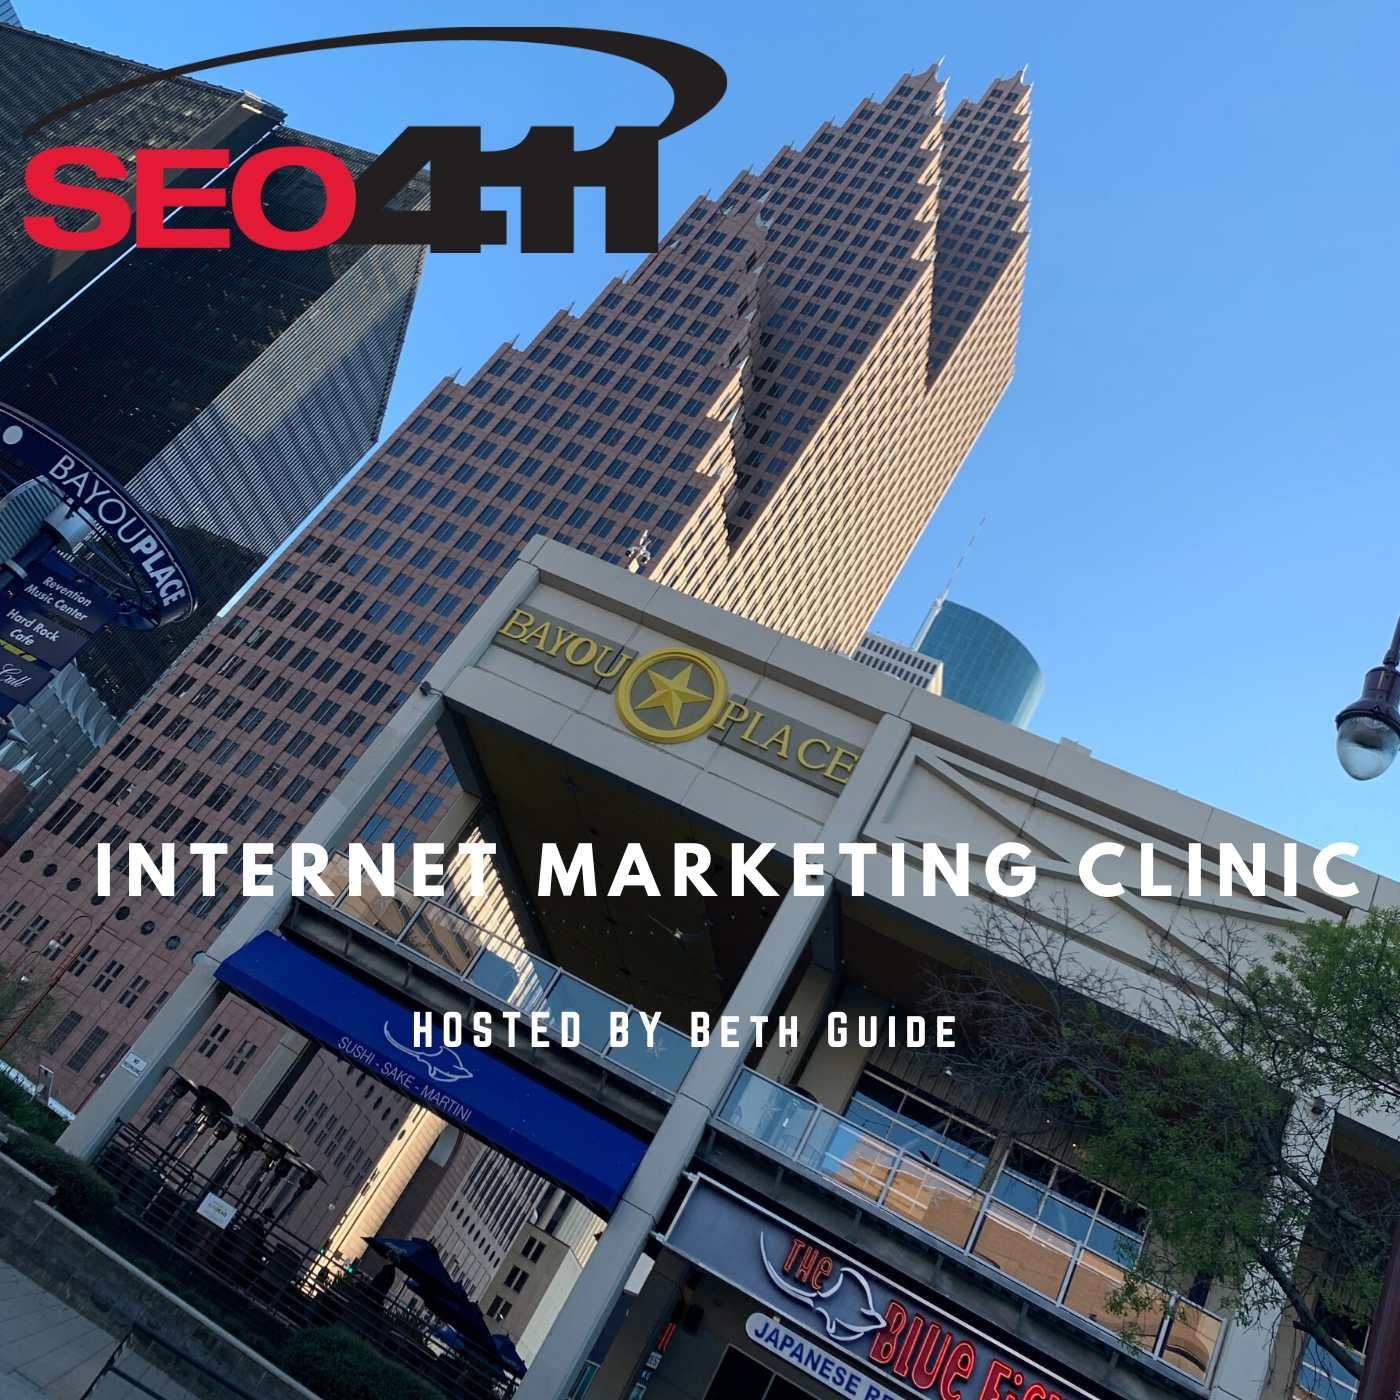 SEO411's Internet Marketing Clinic